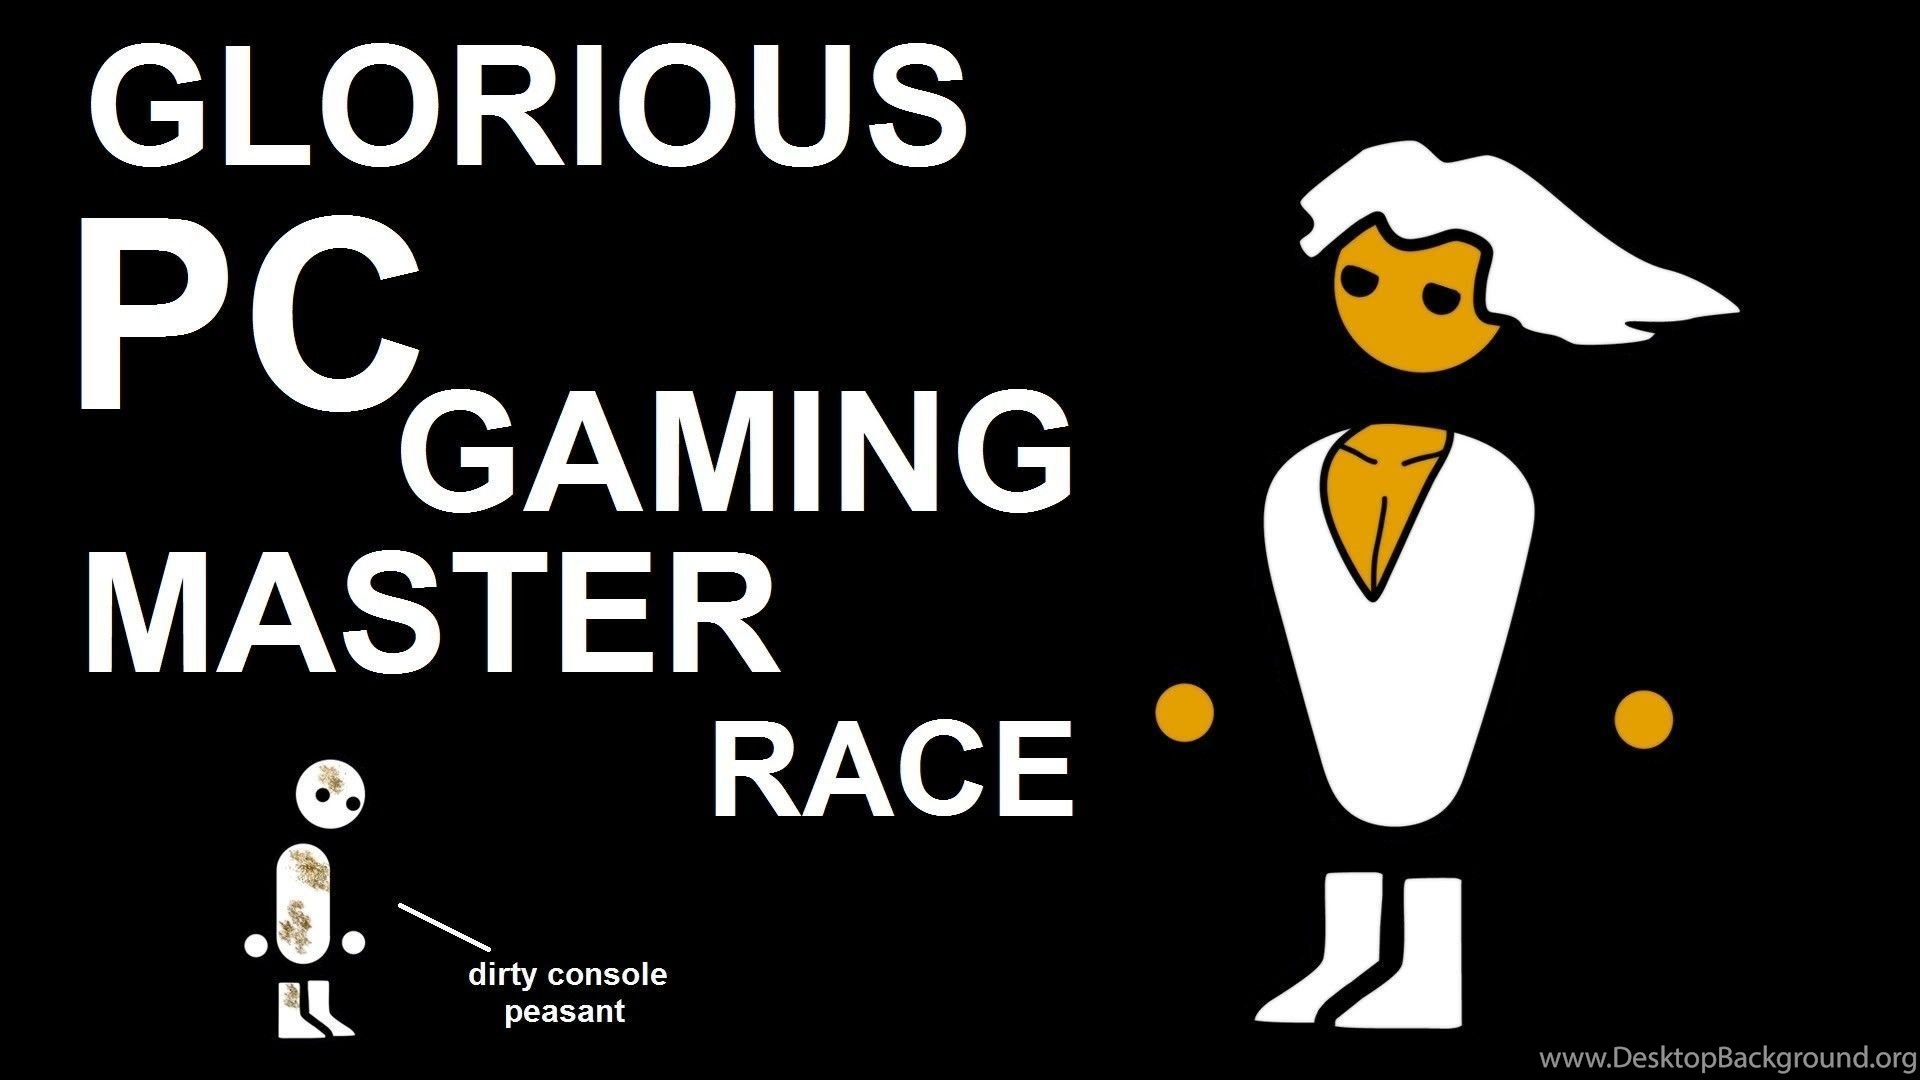 The Pc Master Race Image The Debating Society Mod Db Desktop